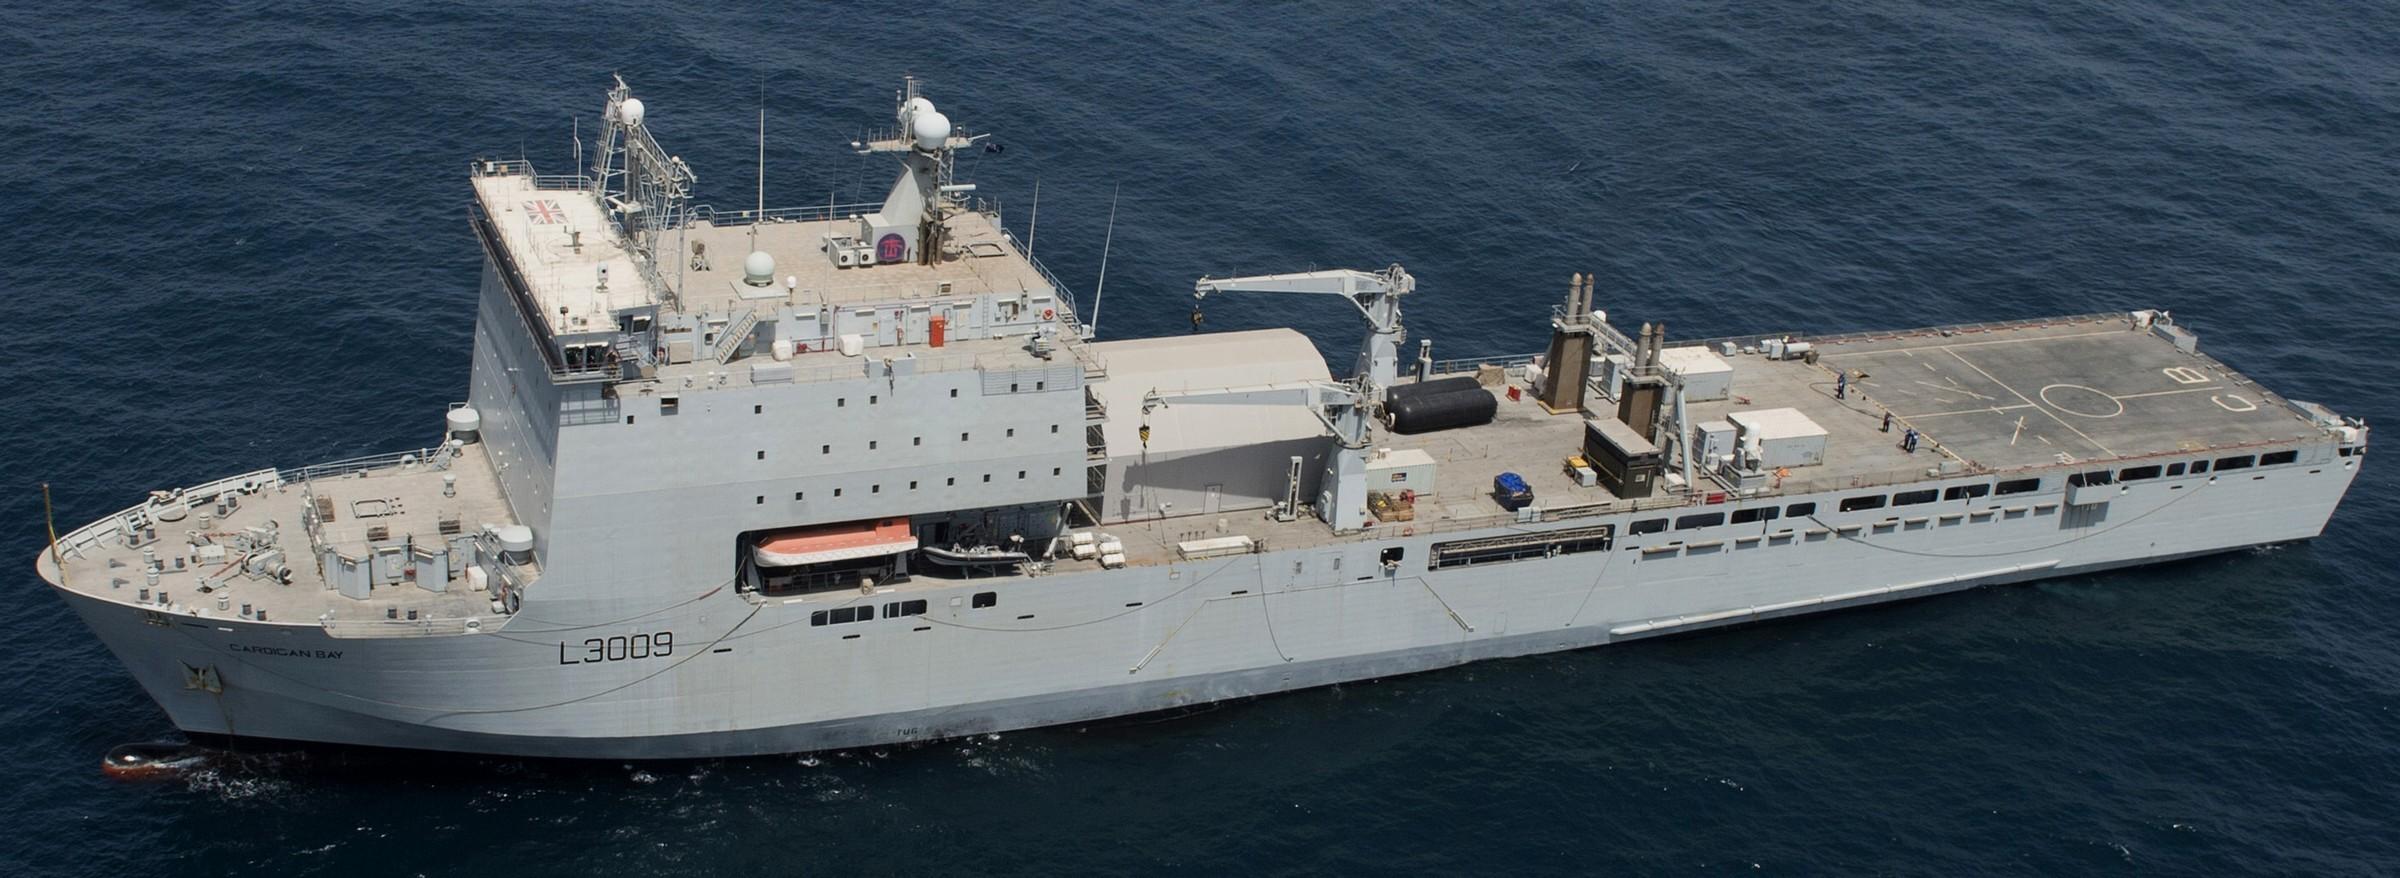 https://www.seaforces.org/marint/Royal-Navy/Amphibious-Ship/L3009-RFA-Cardigan-Bay_DAT/L3009-RFA-Cardigan-Bay-012.jpg